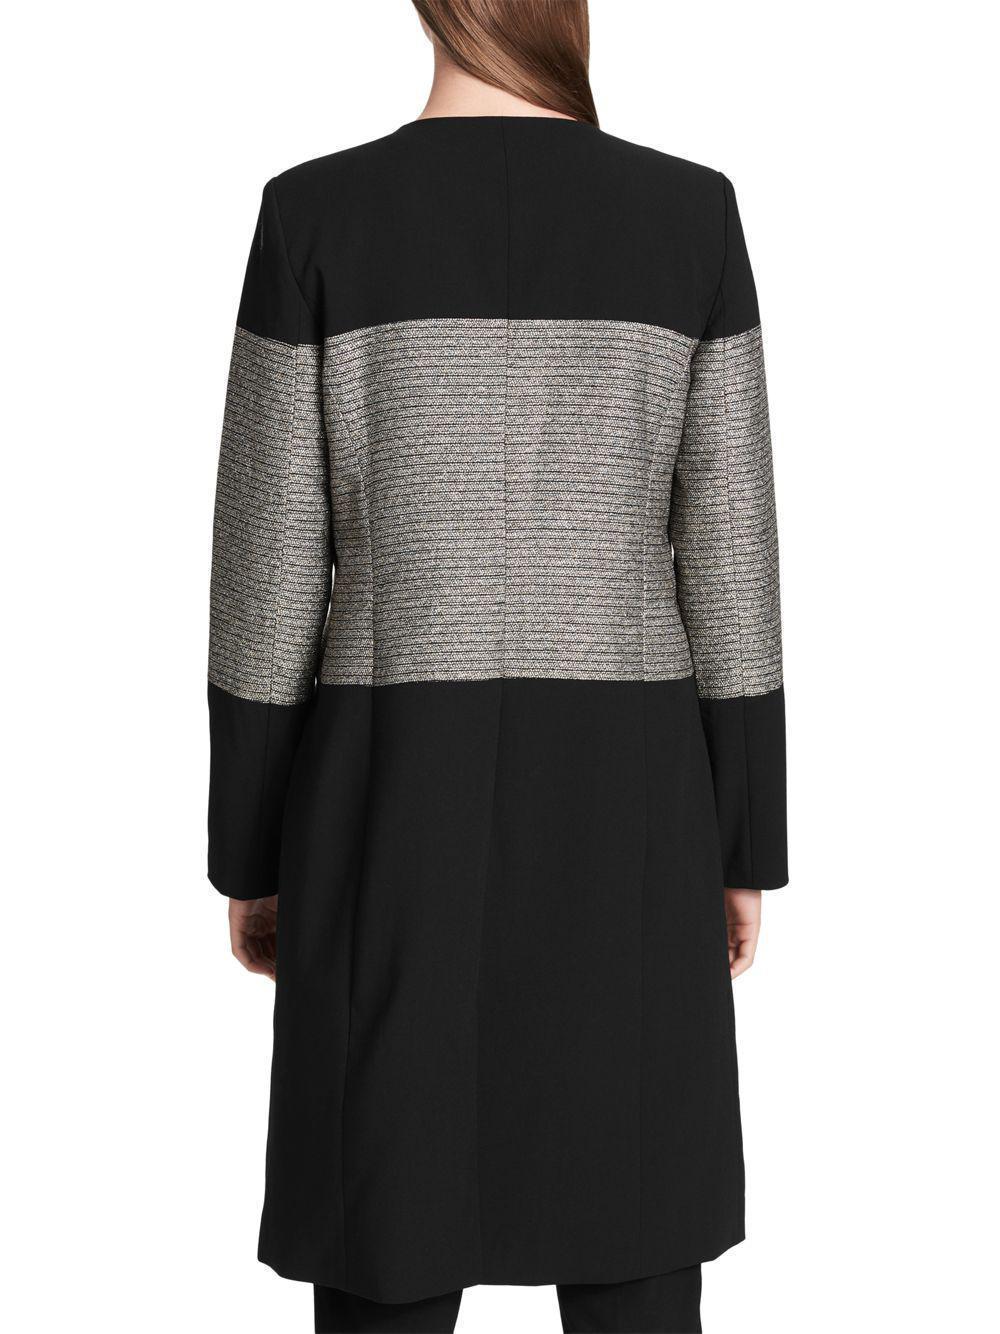 New Calvin Klein Women Open Front Glitter Accented Topper Jacket Blk Variety Szs